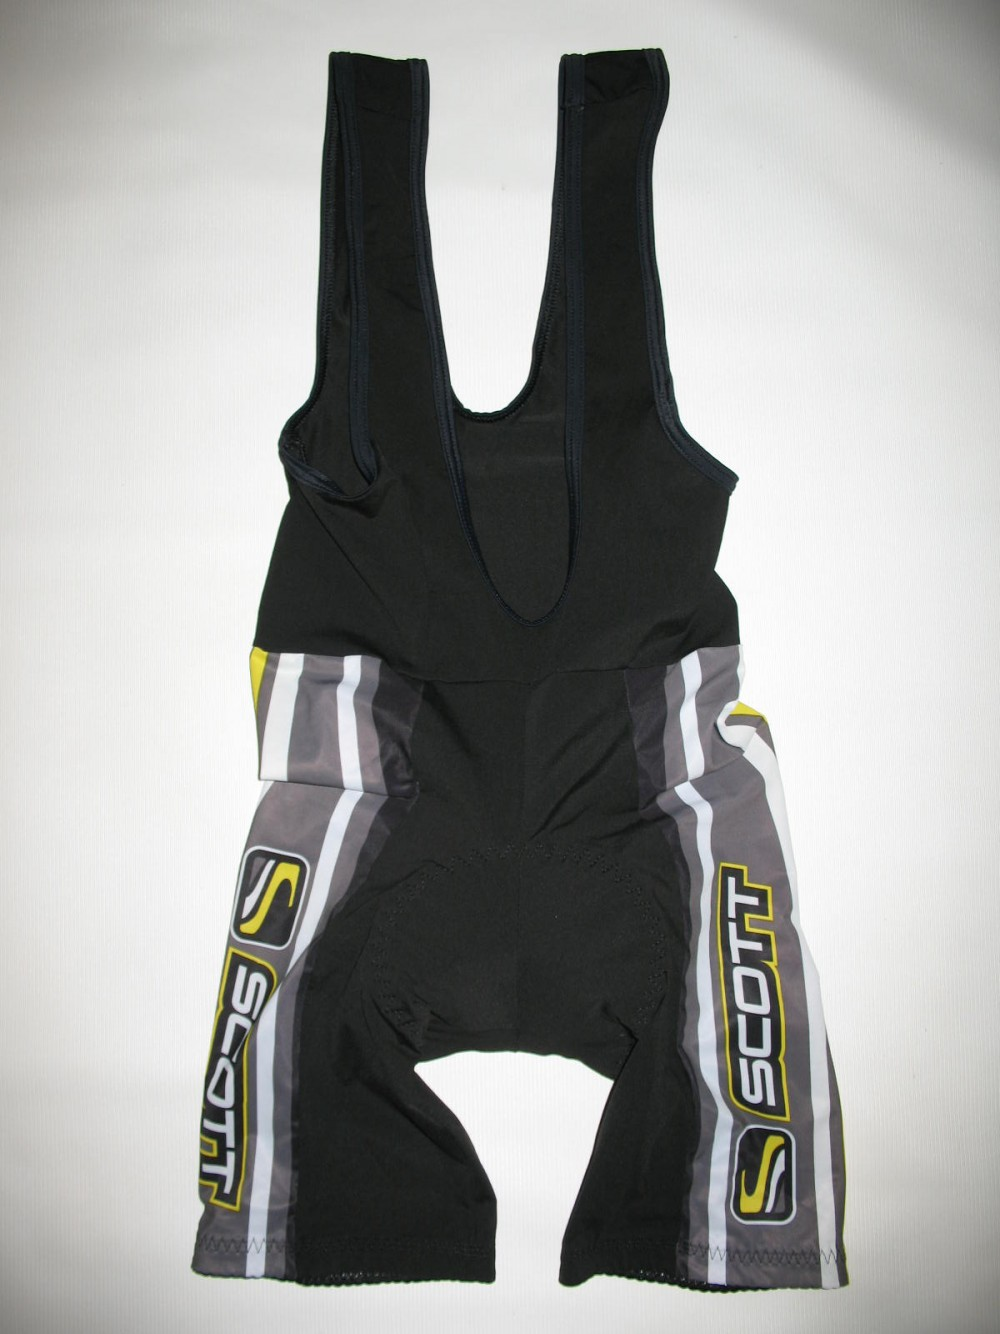 Велошорты BIEMME scott bib cycling shorts (размер 3/M) - 1